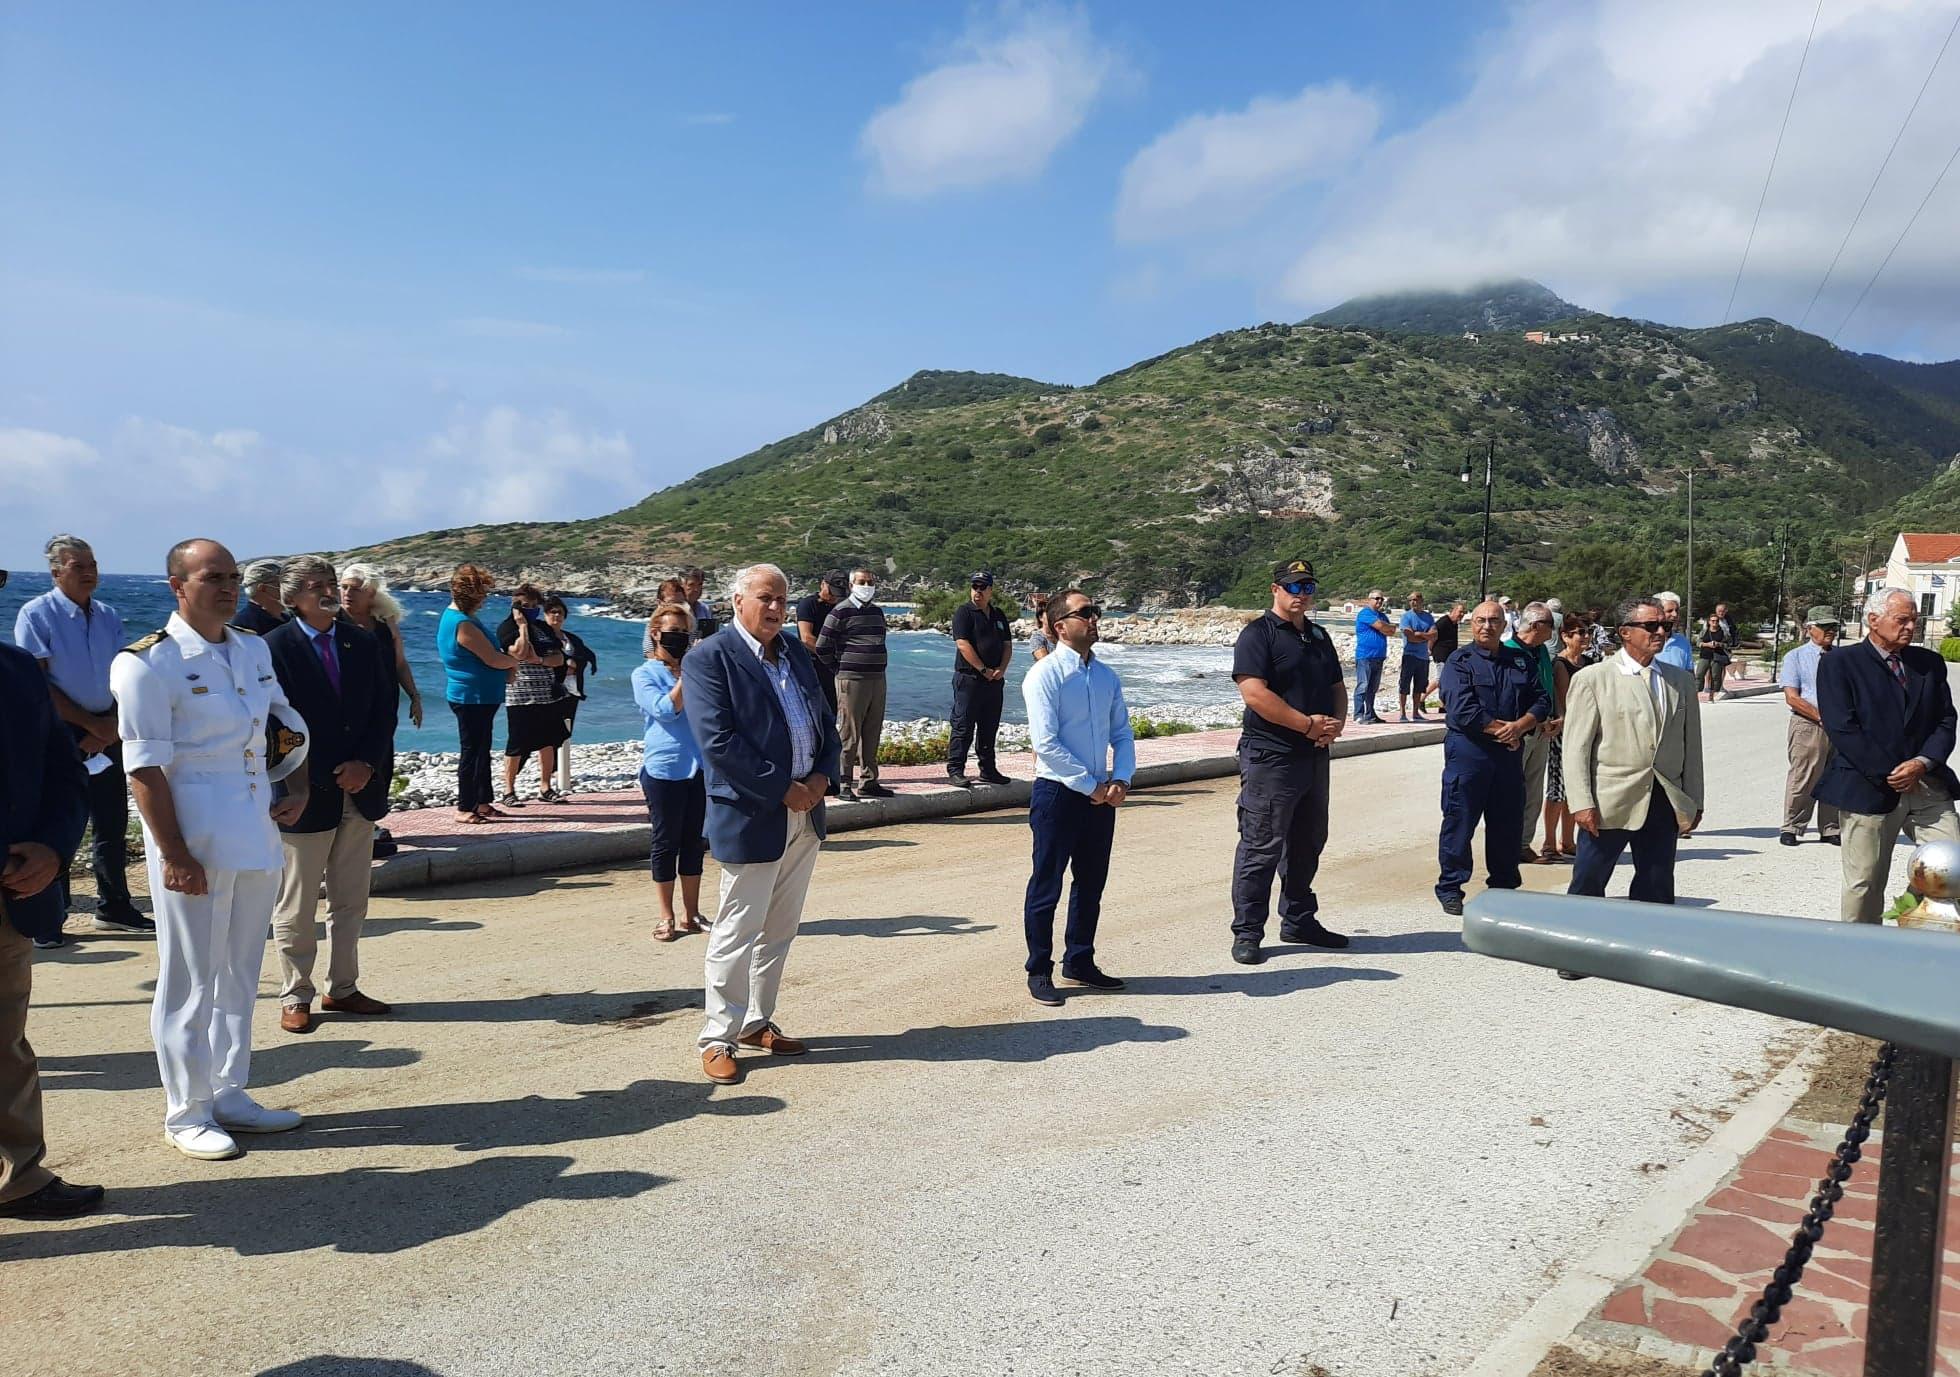 corfu.gr-2020-09-28_08-13-59_432541